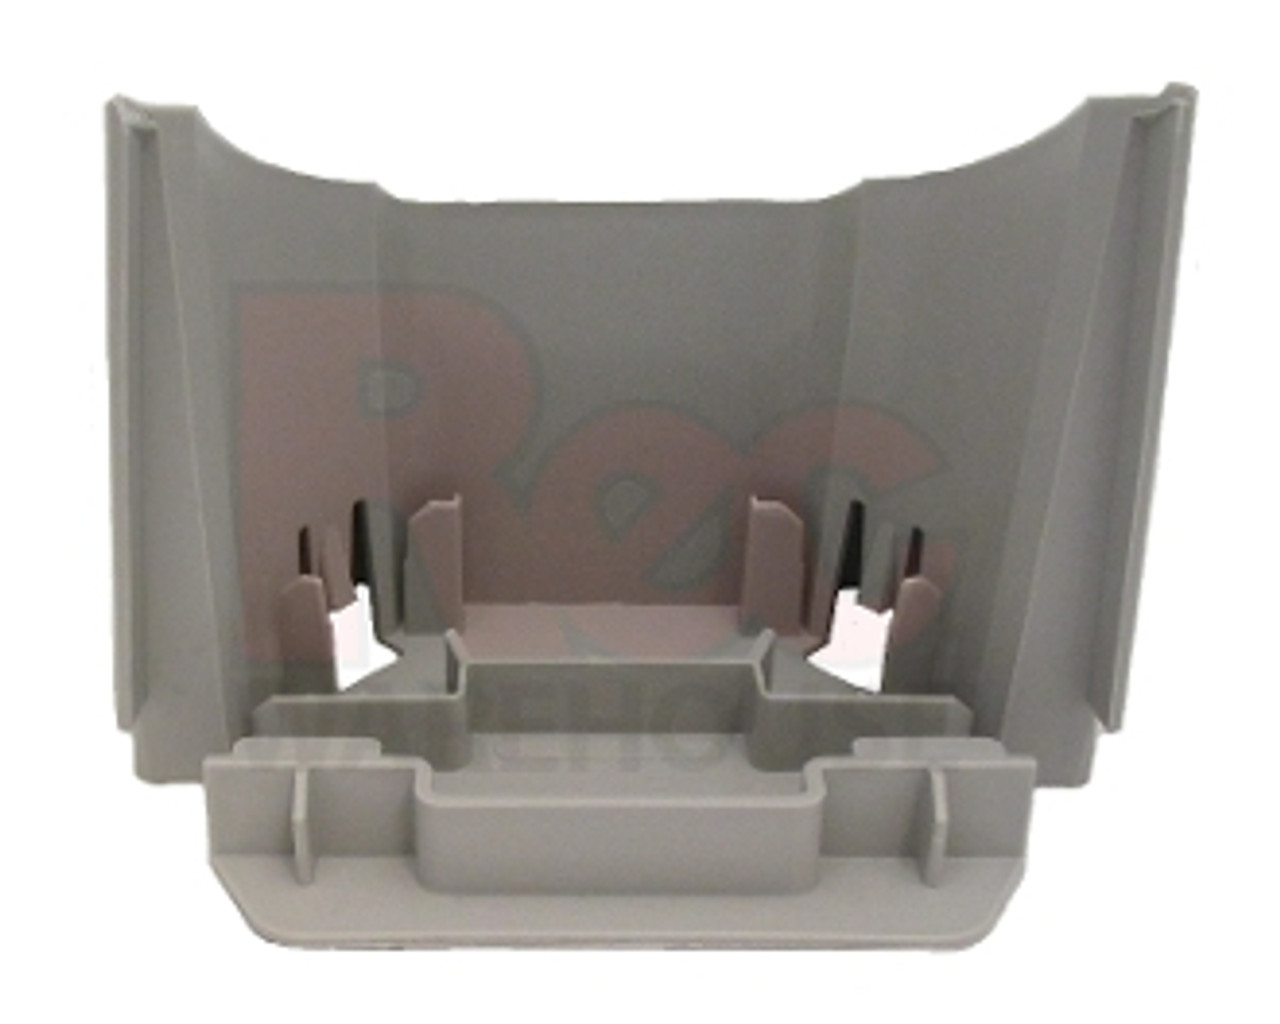 WILBAR BERMUDA/OASIS/NAVIGATOR/INTREPID Bottom Plate Boot - 27117